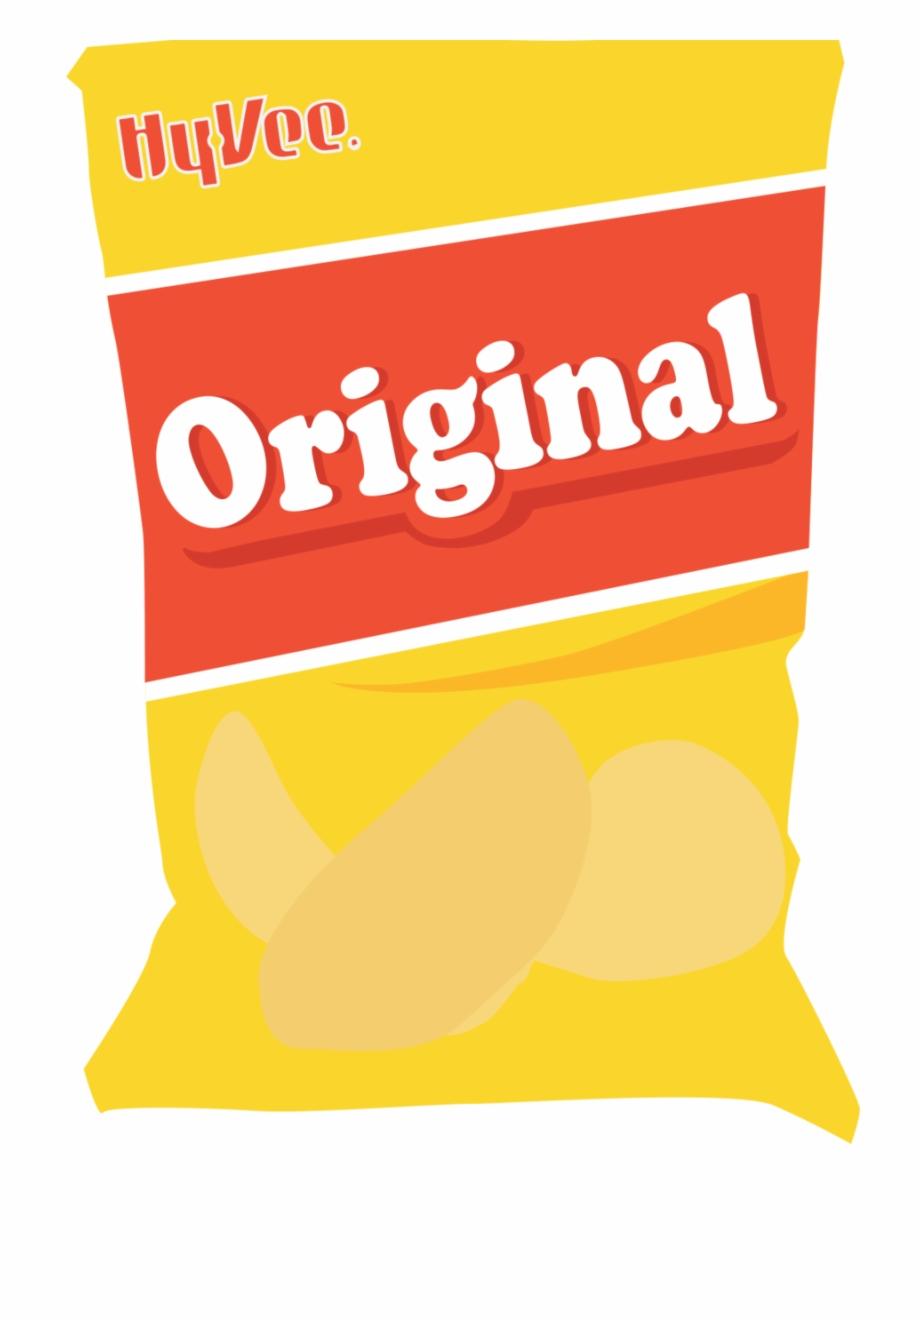 Png junk food potato. Chips clipart bag chip